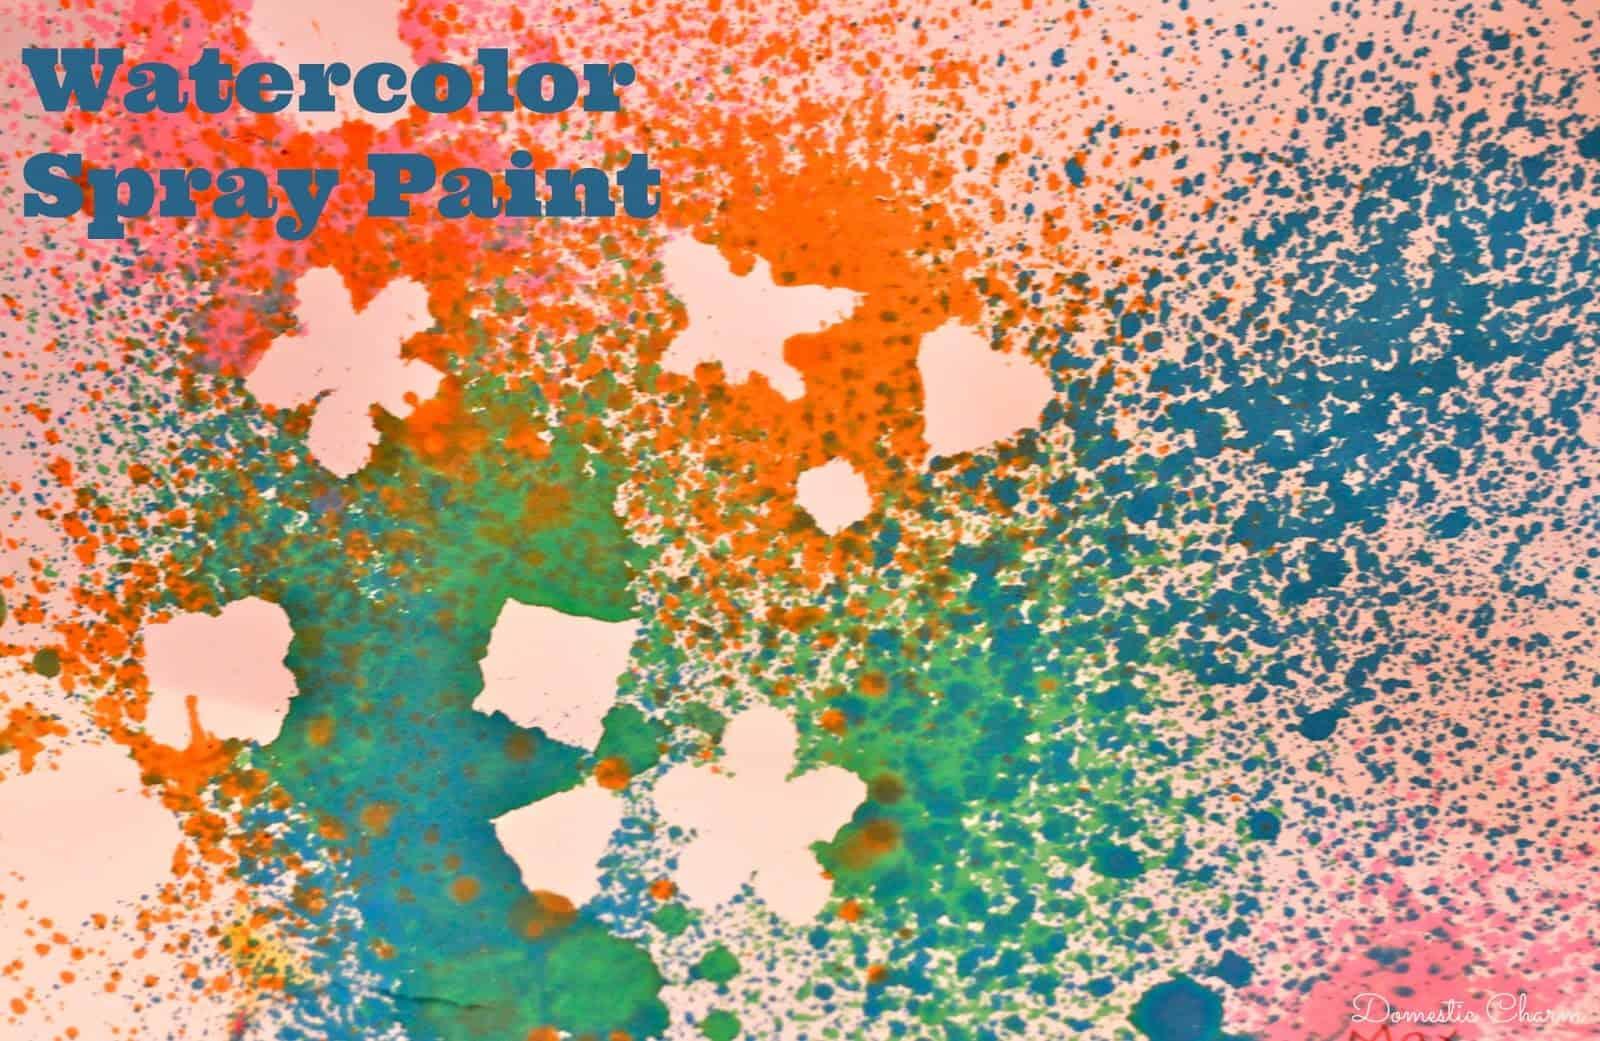 Watercolour spray paint